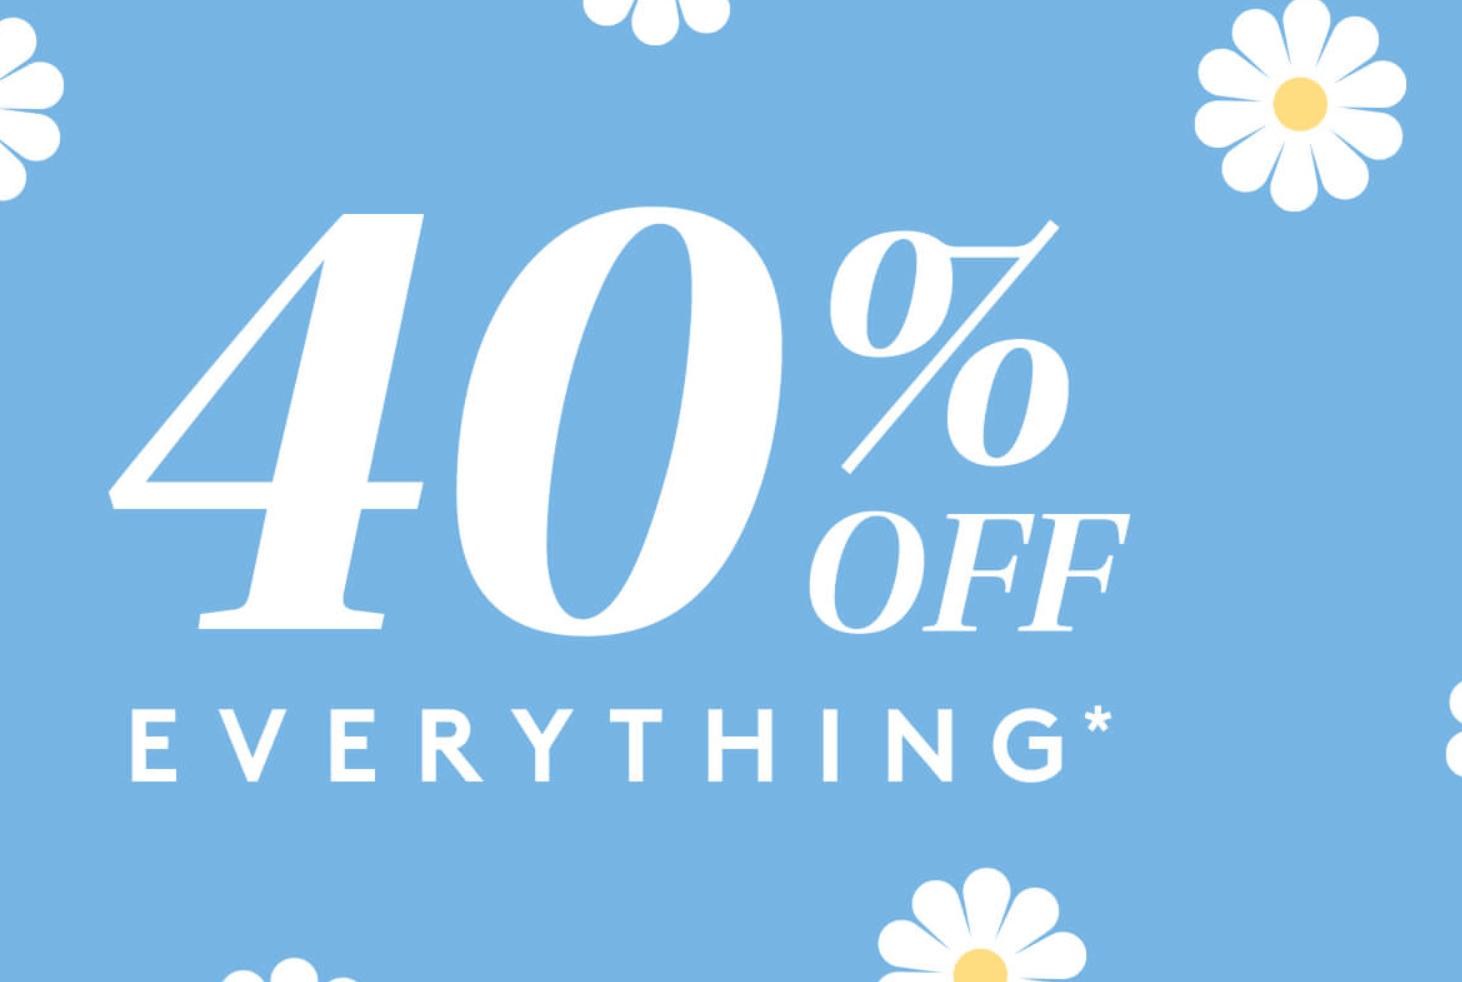 Birchbox – Save 40% Off EVERYTHING